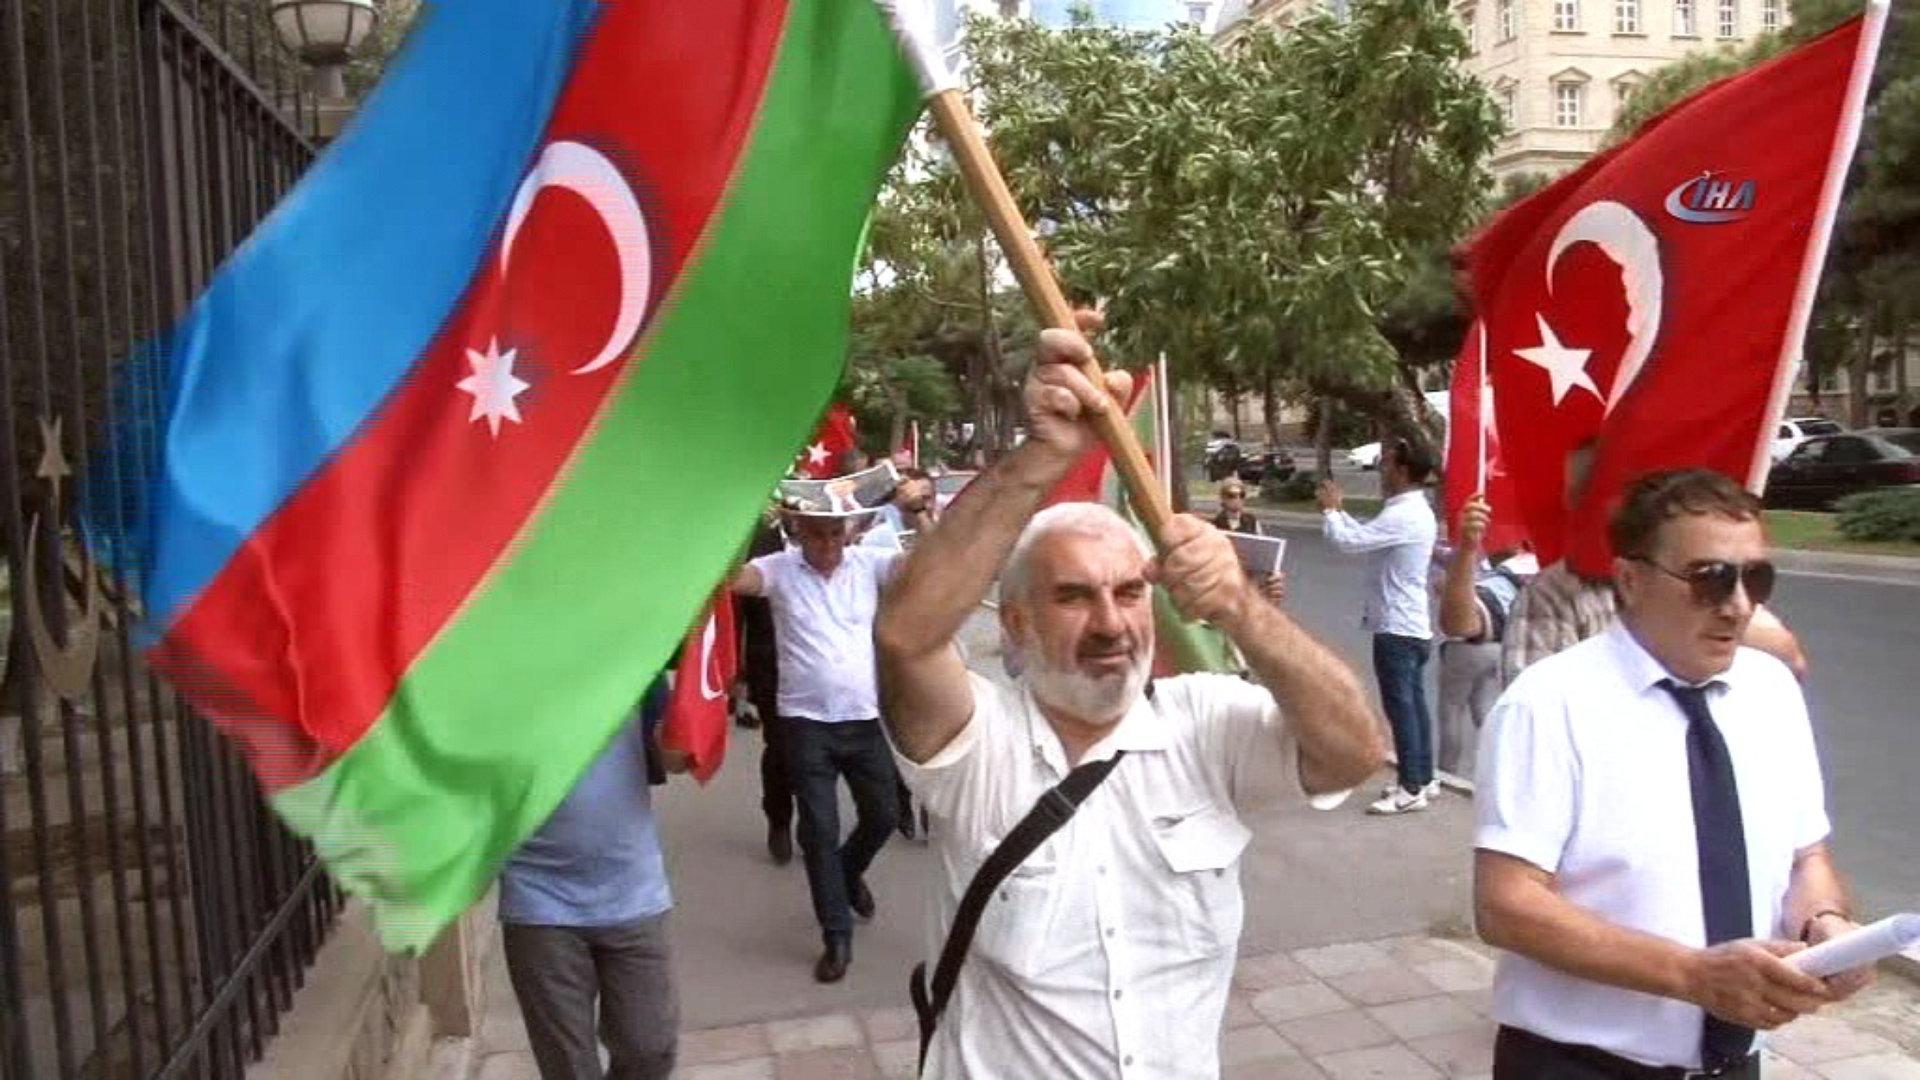 Azerbaycan halkı Rus barış kuvvetini reddediyor!